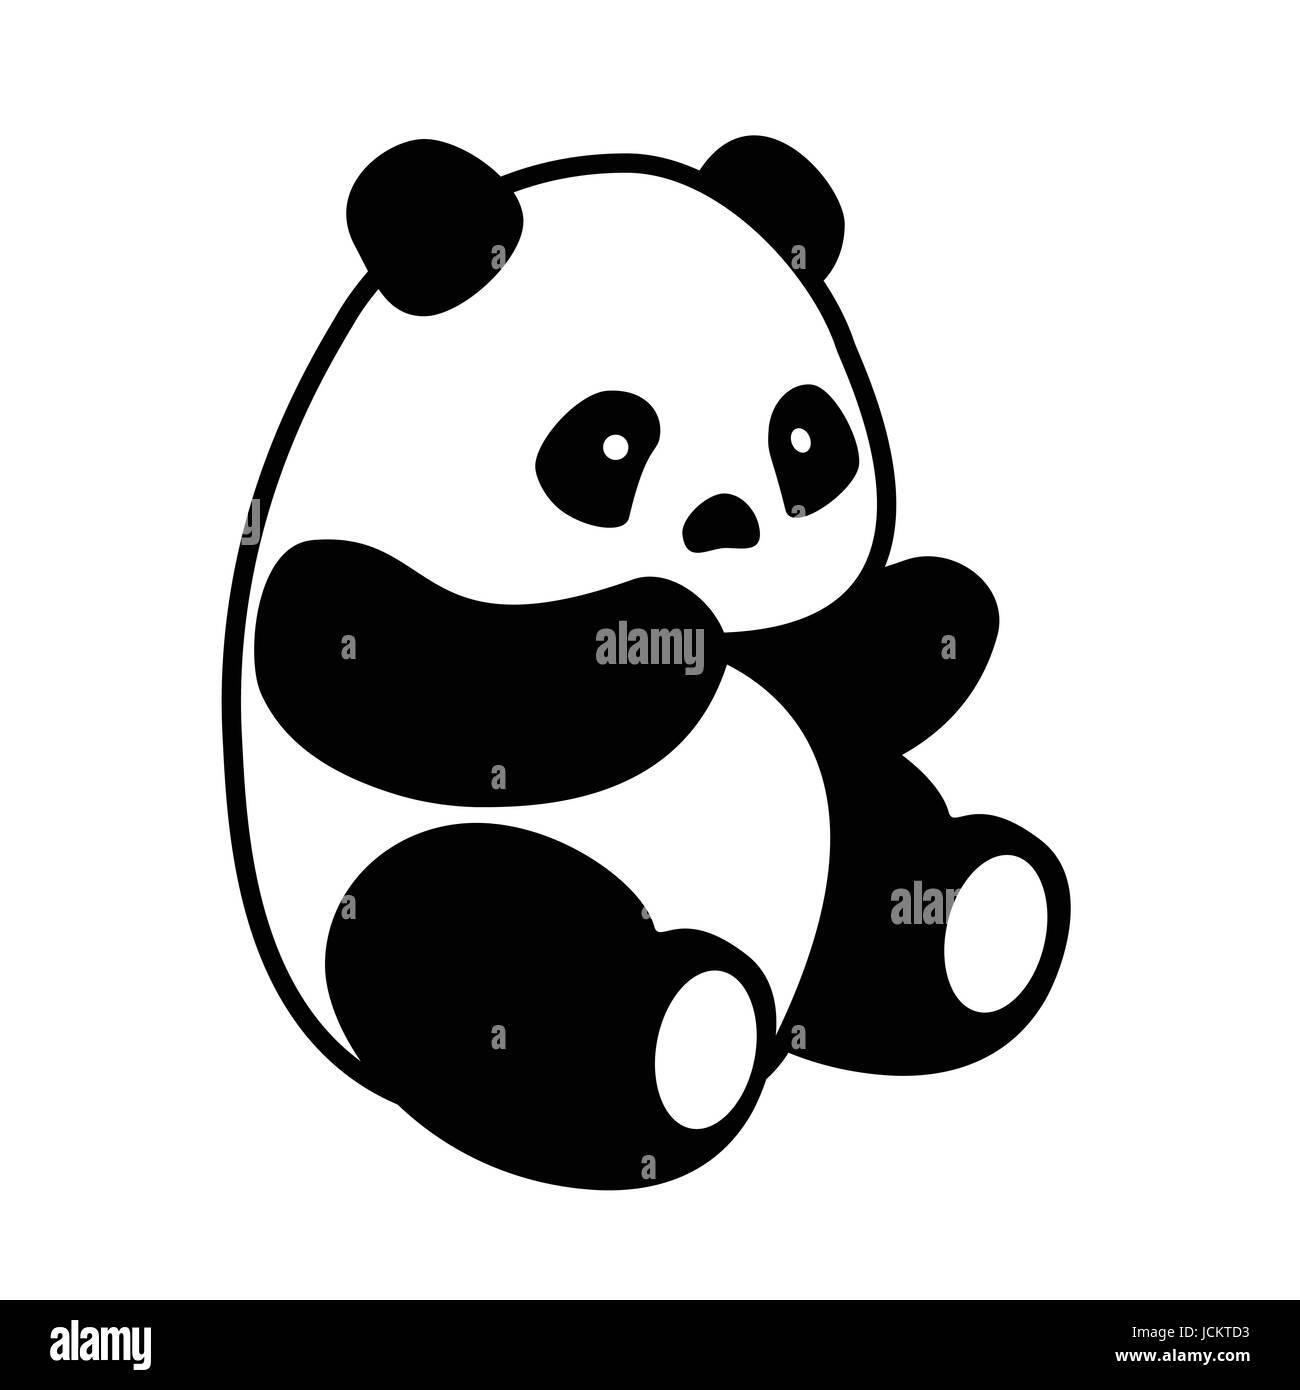 Panda Bear Black And White Stock Photos Images Alamy